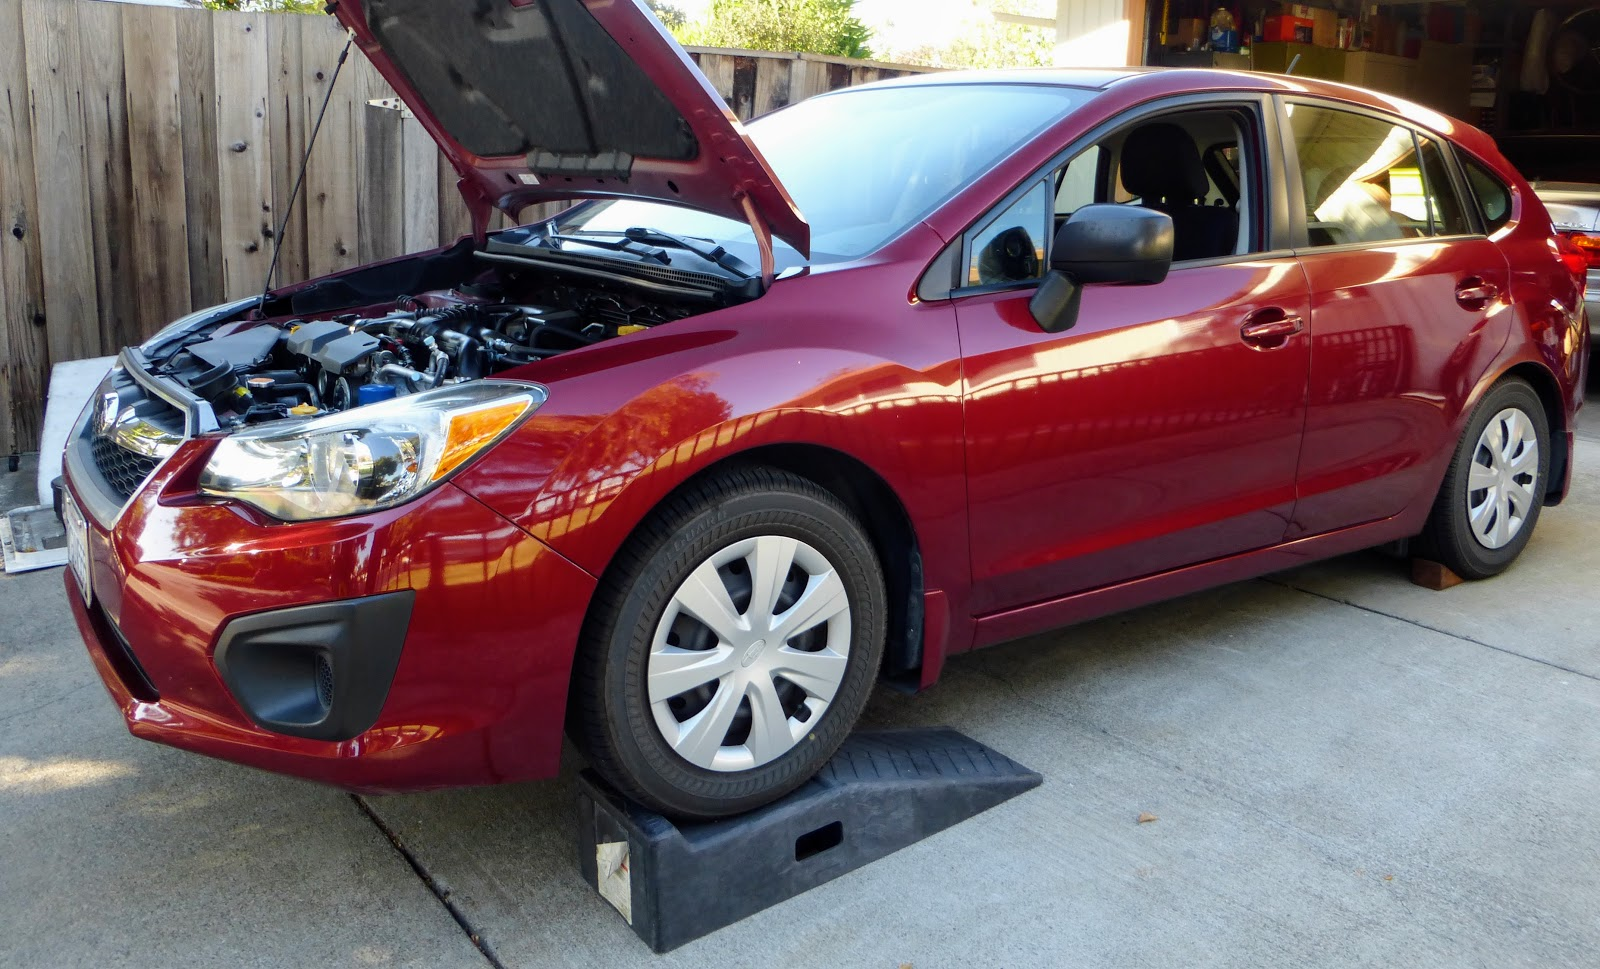 Paolo Baltar: 2012 Subaru Impreza Engine Oil Change